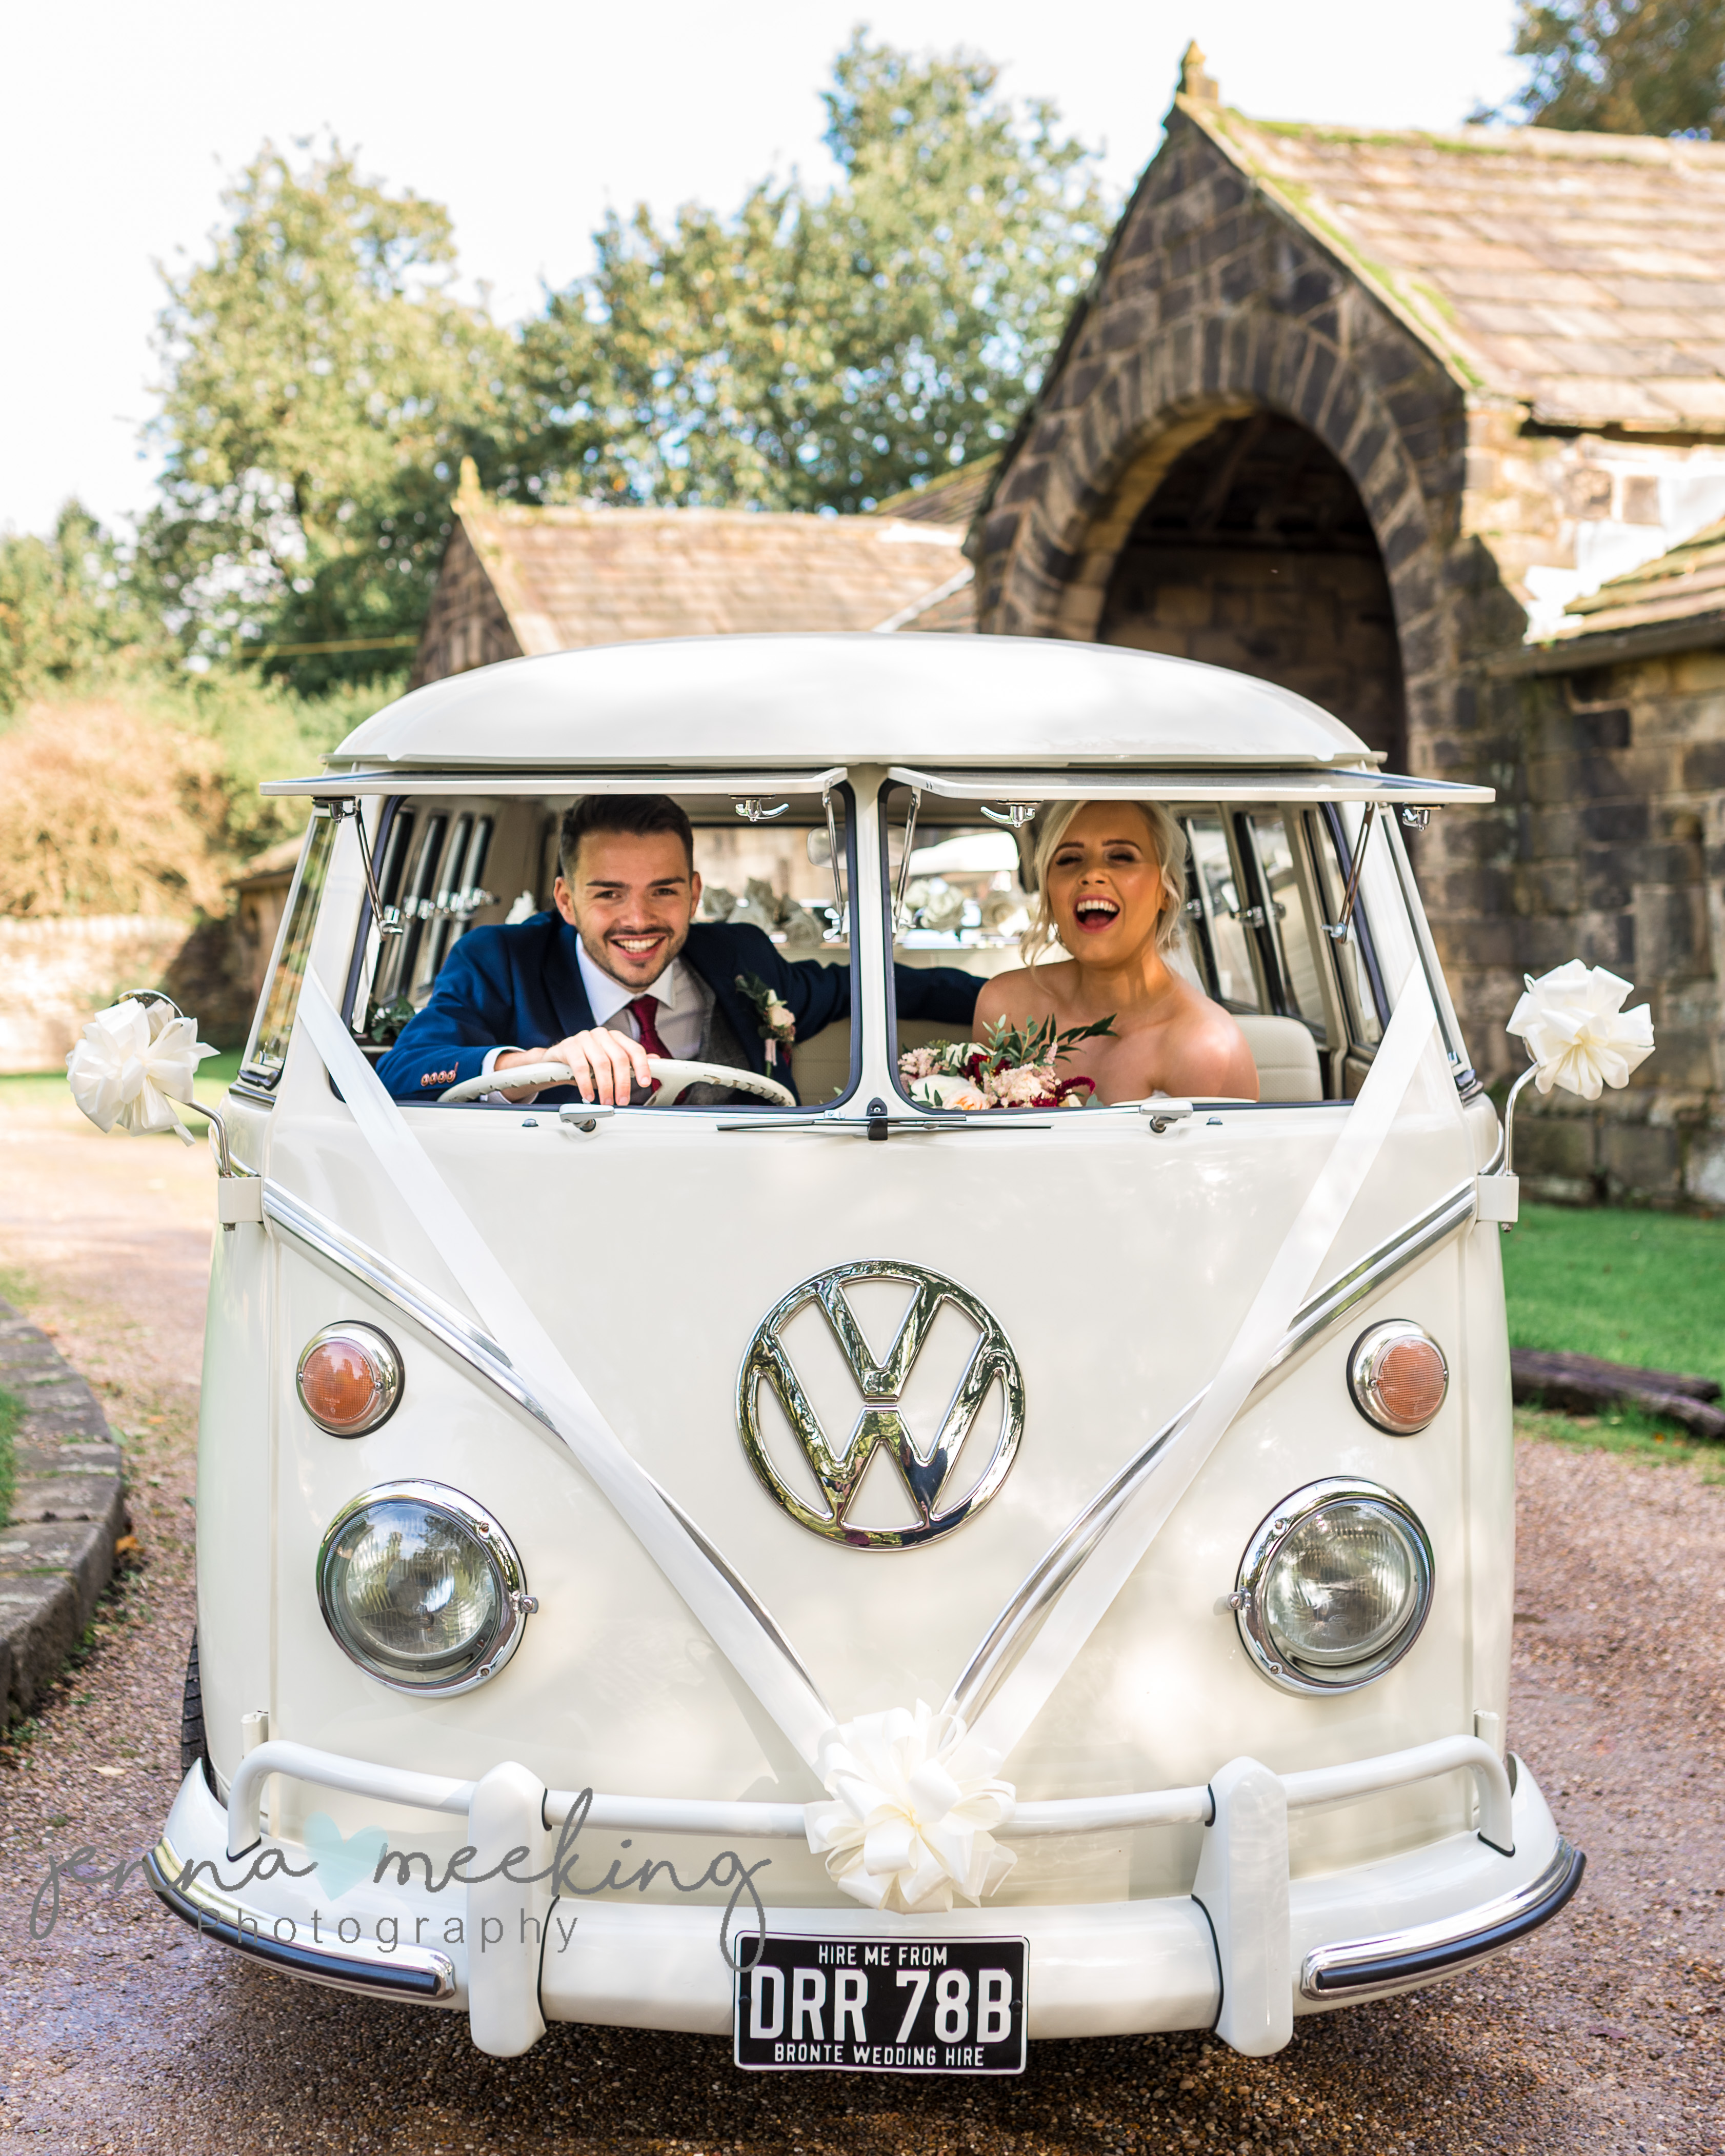 Wedding photographer Yorkshire Leeds